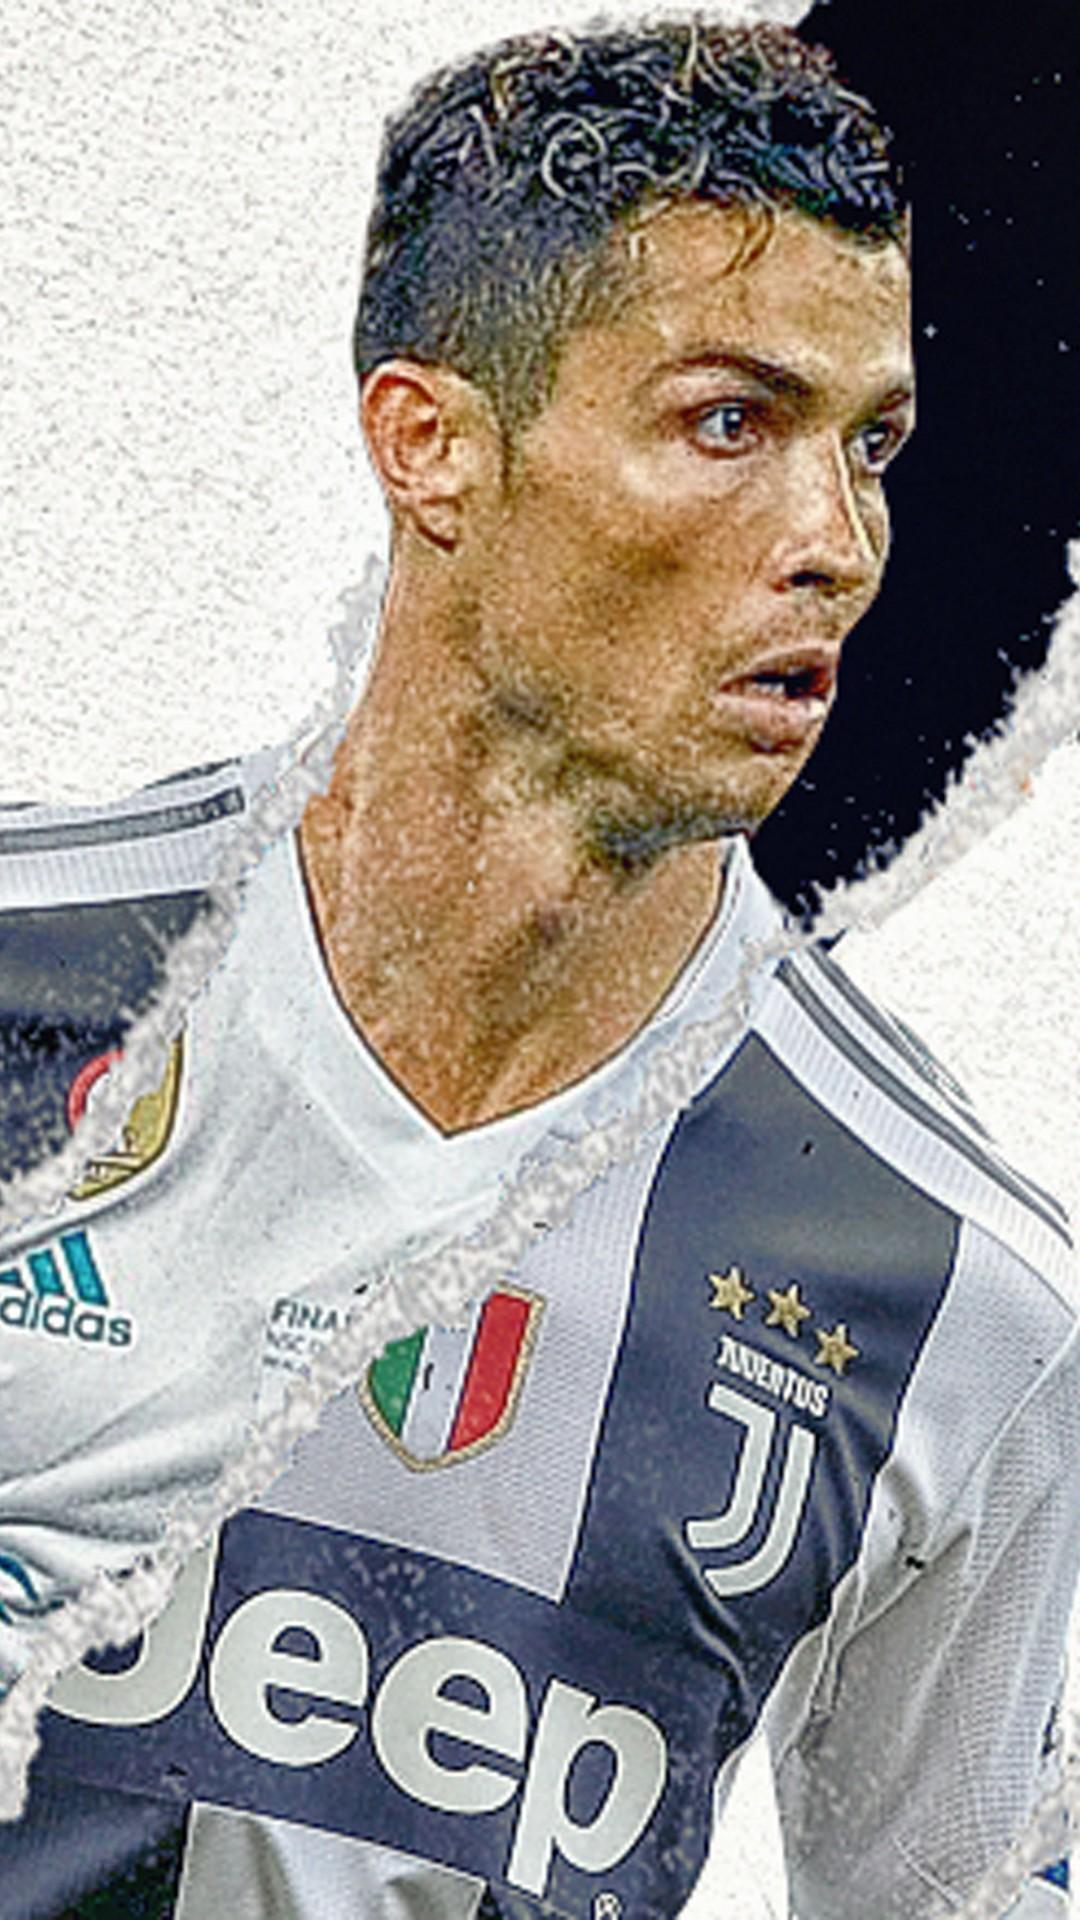 Android Wallpaper HD Cristiano Ronaldo Juventus   2020 Android 1080x1920